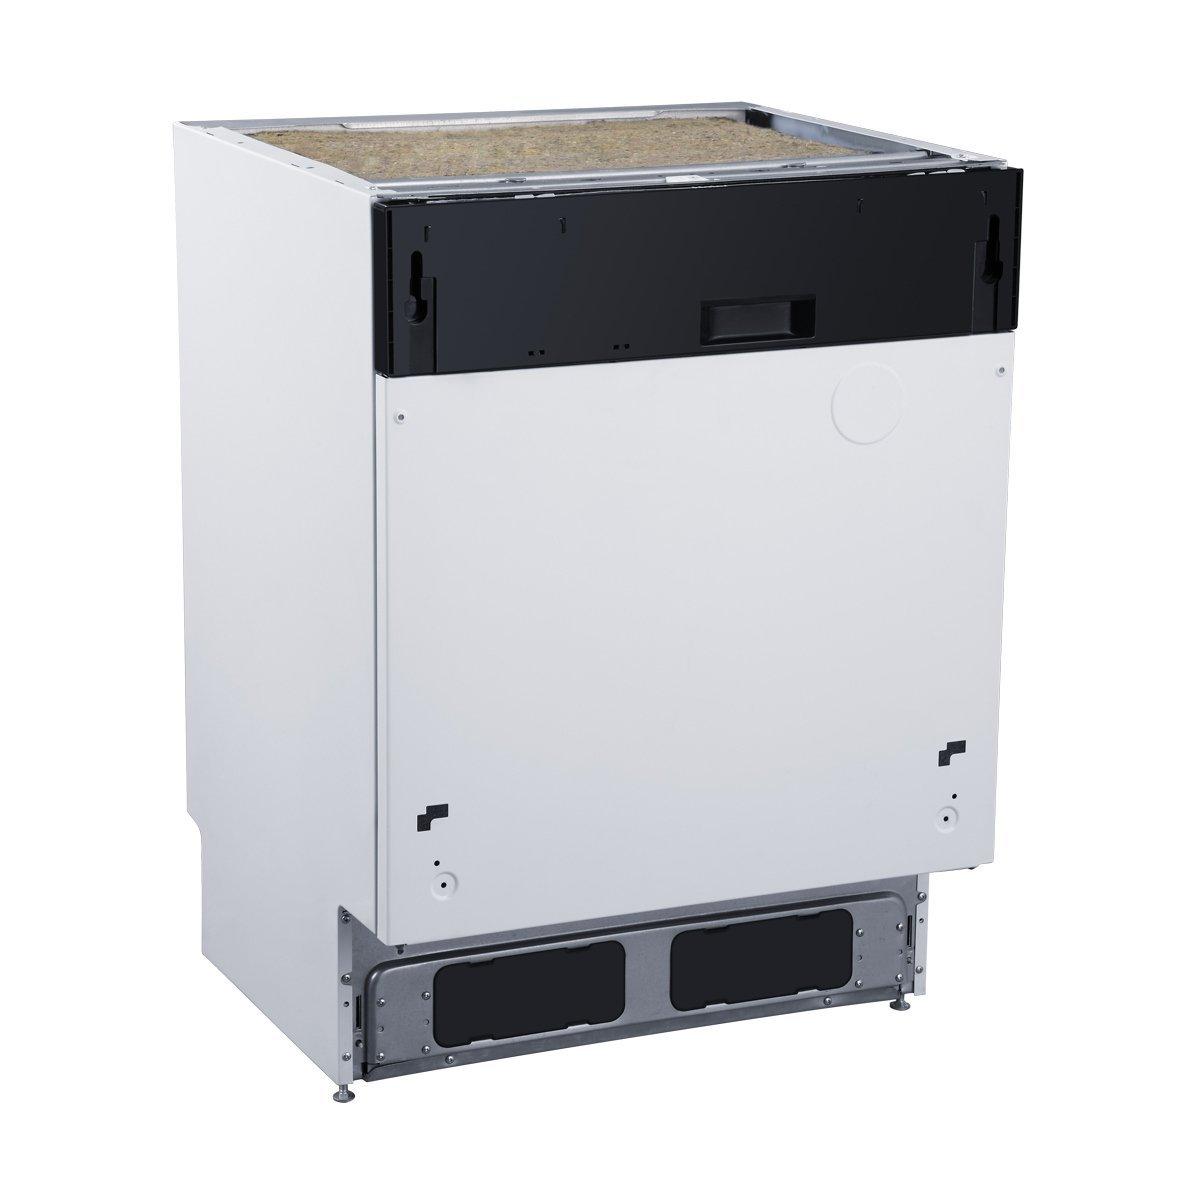 Máy rửa chén Haier Hale WQP12-CBE7H-T cả máy rửa bát (cần ngoài khảm trang trí ván cửa)